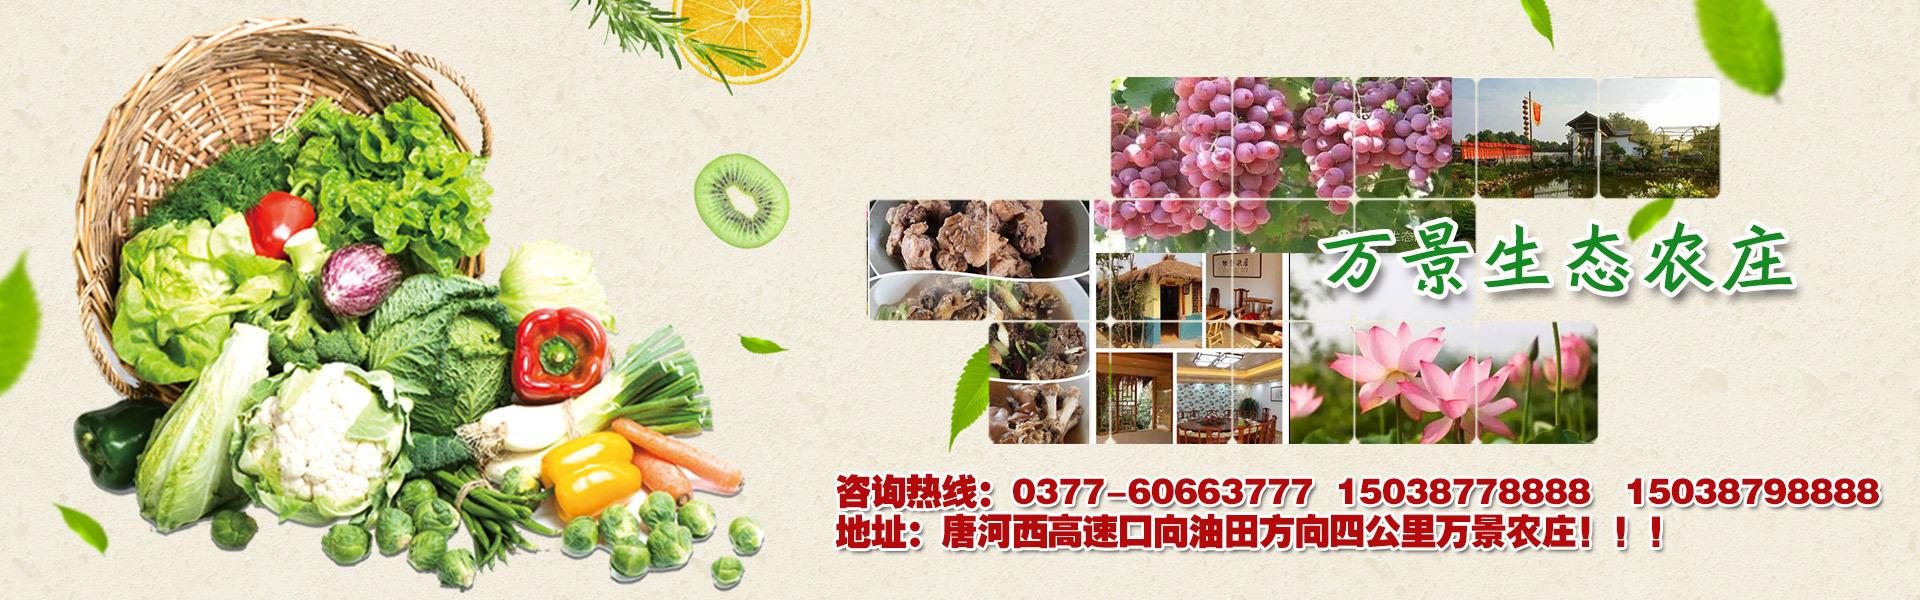 2138q.com太阳城